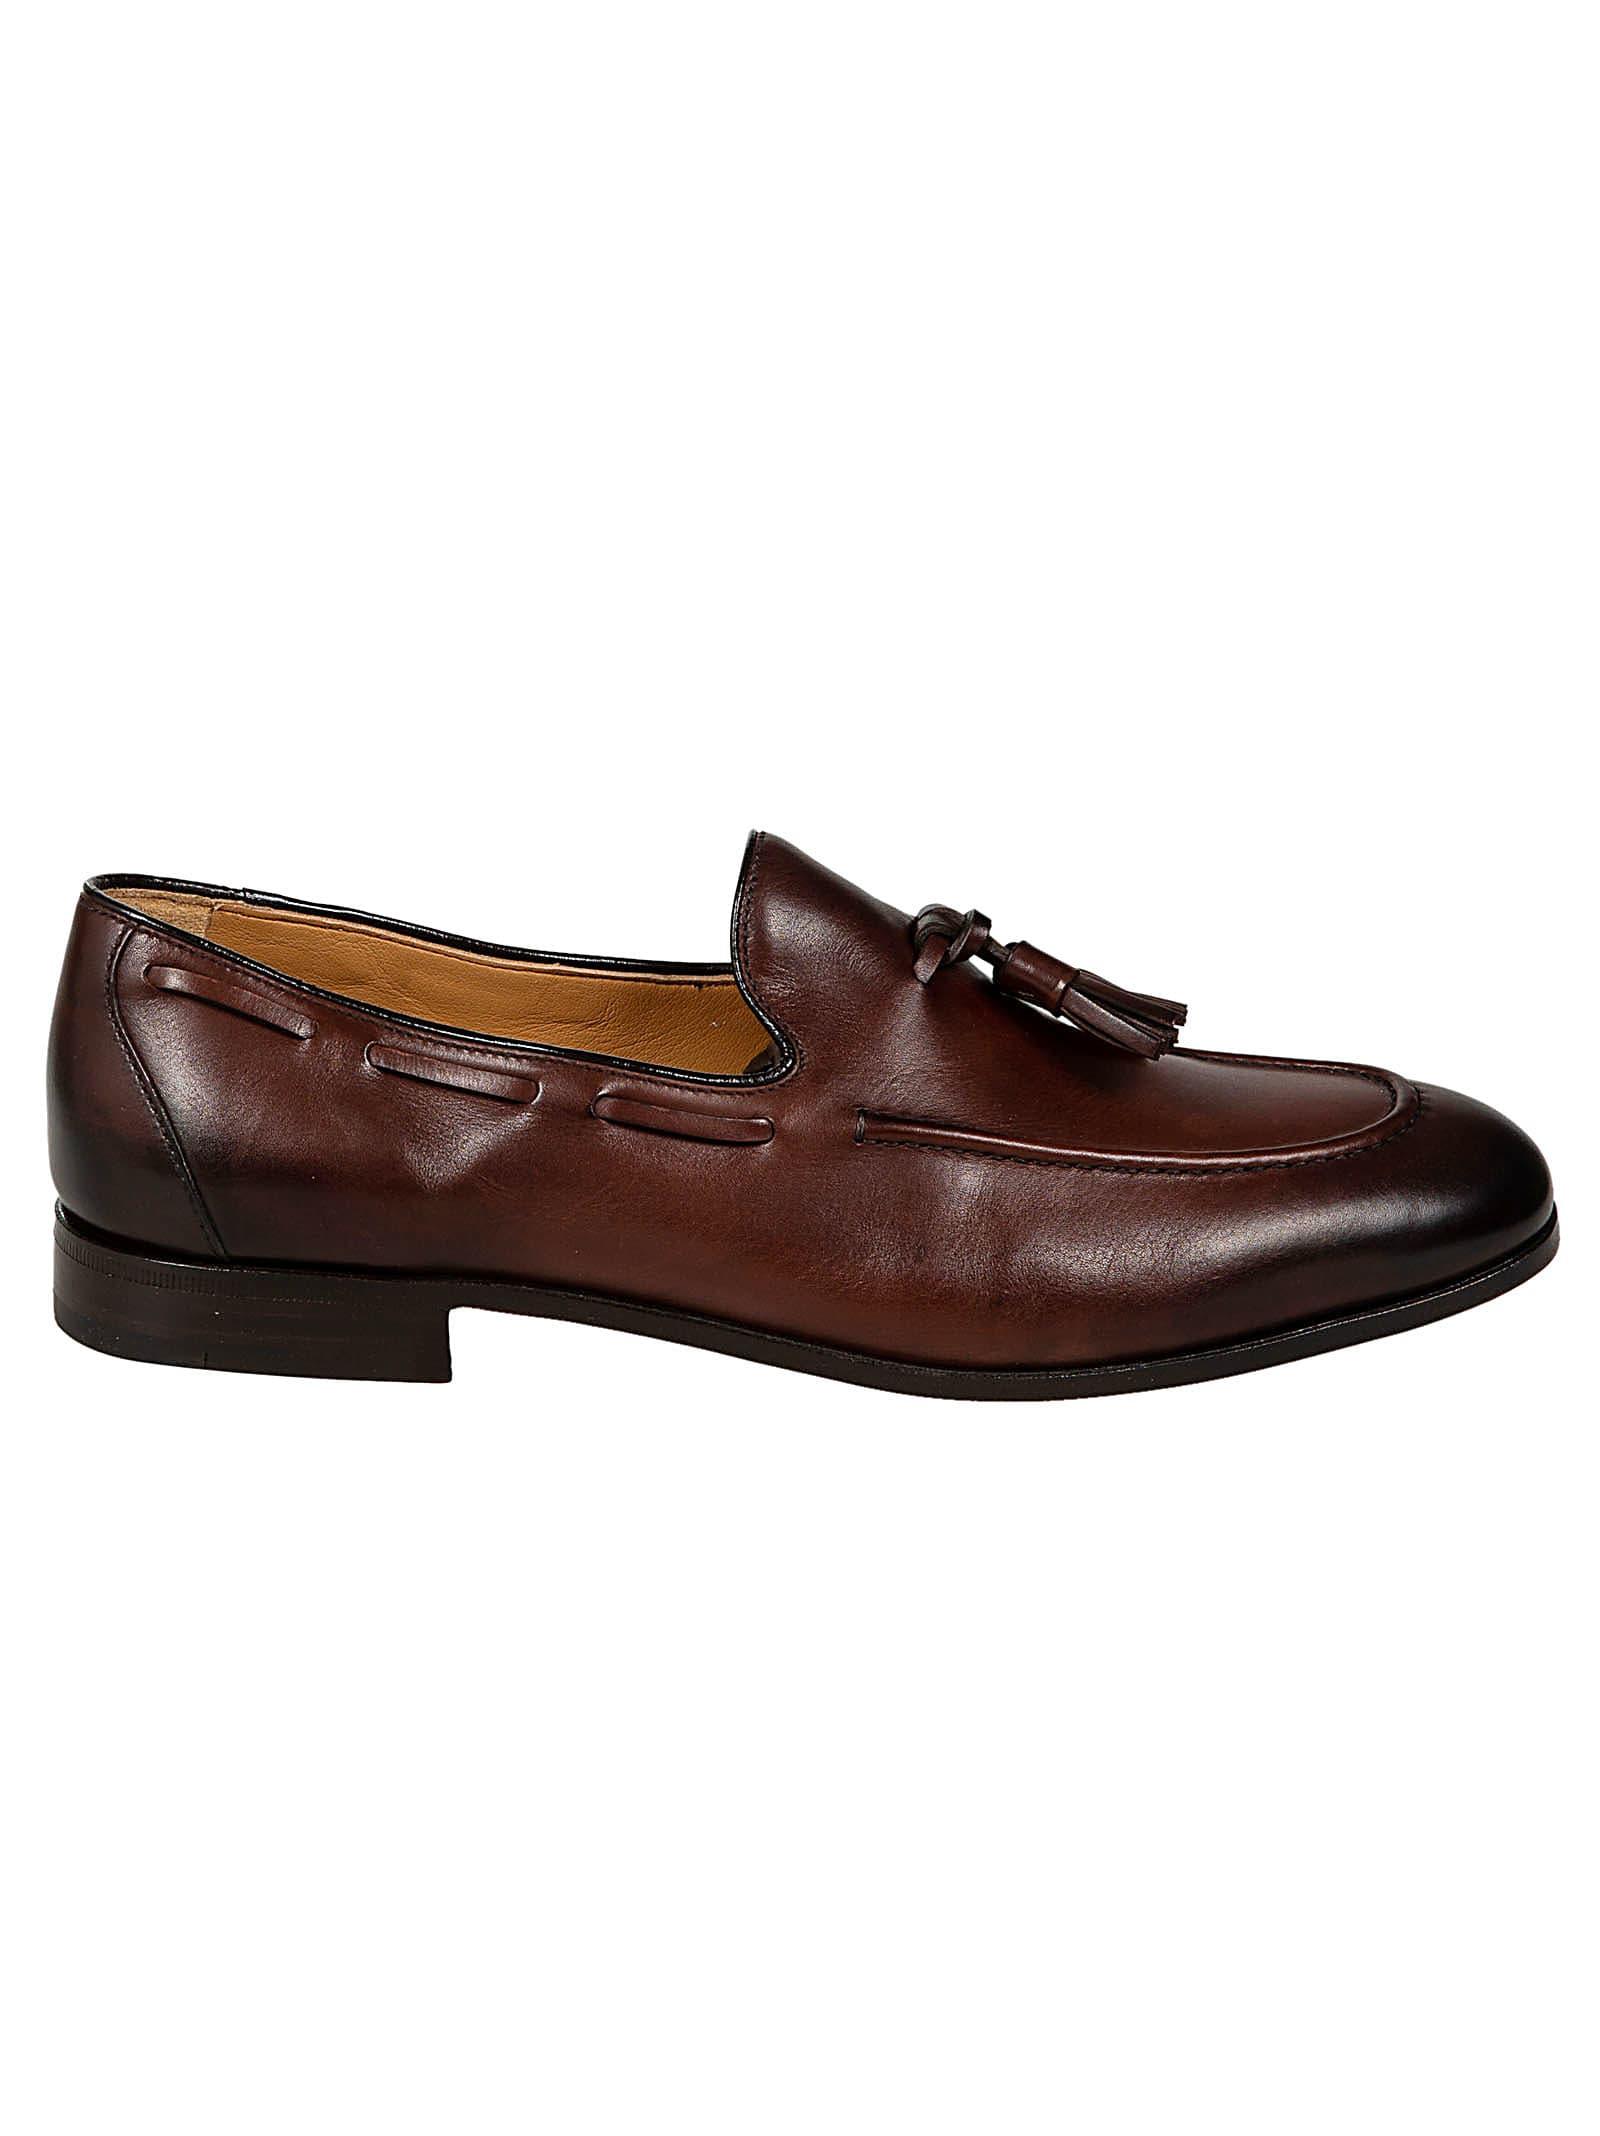 Churchs Tassel Detail Loafers